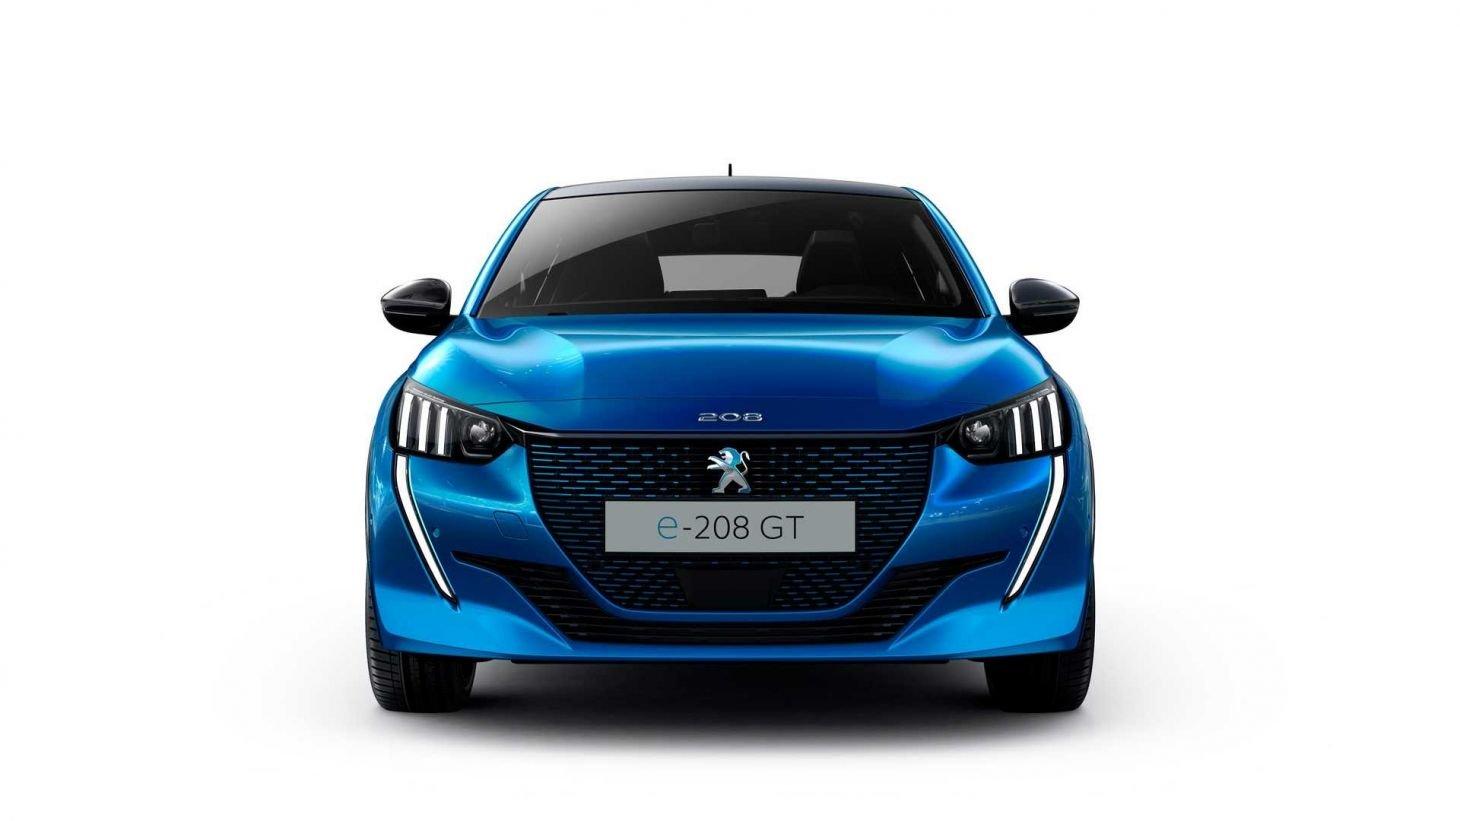 Novo Peugeot e-208 elétrico na cor azul visto de frente